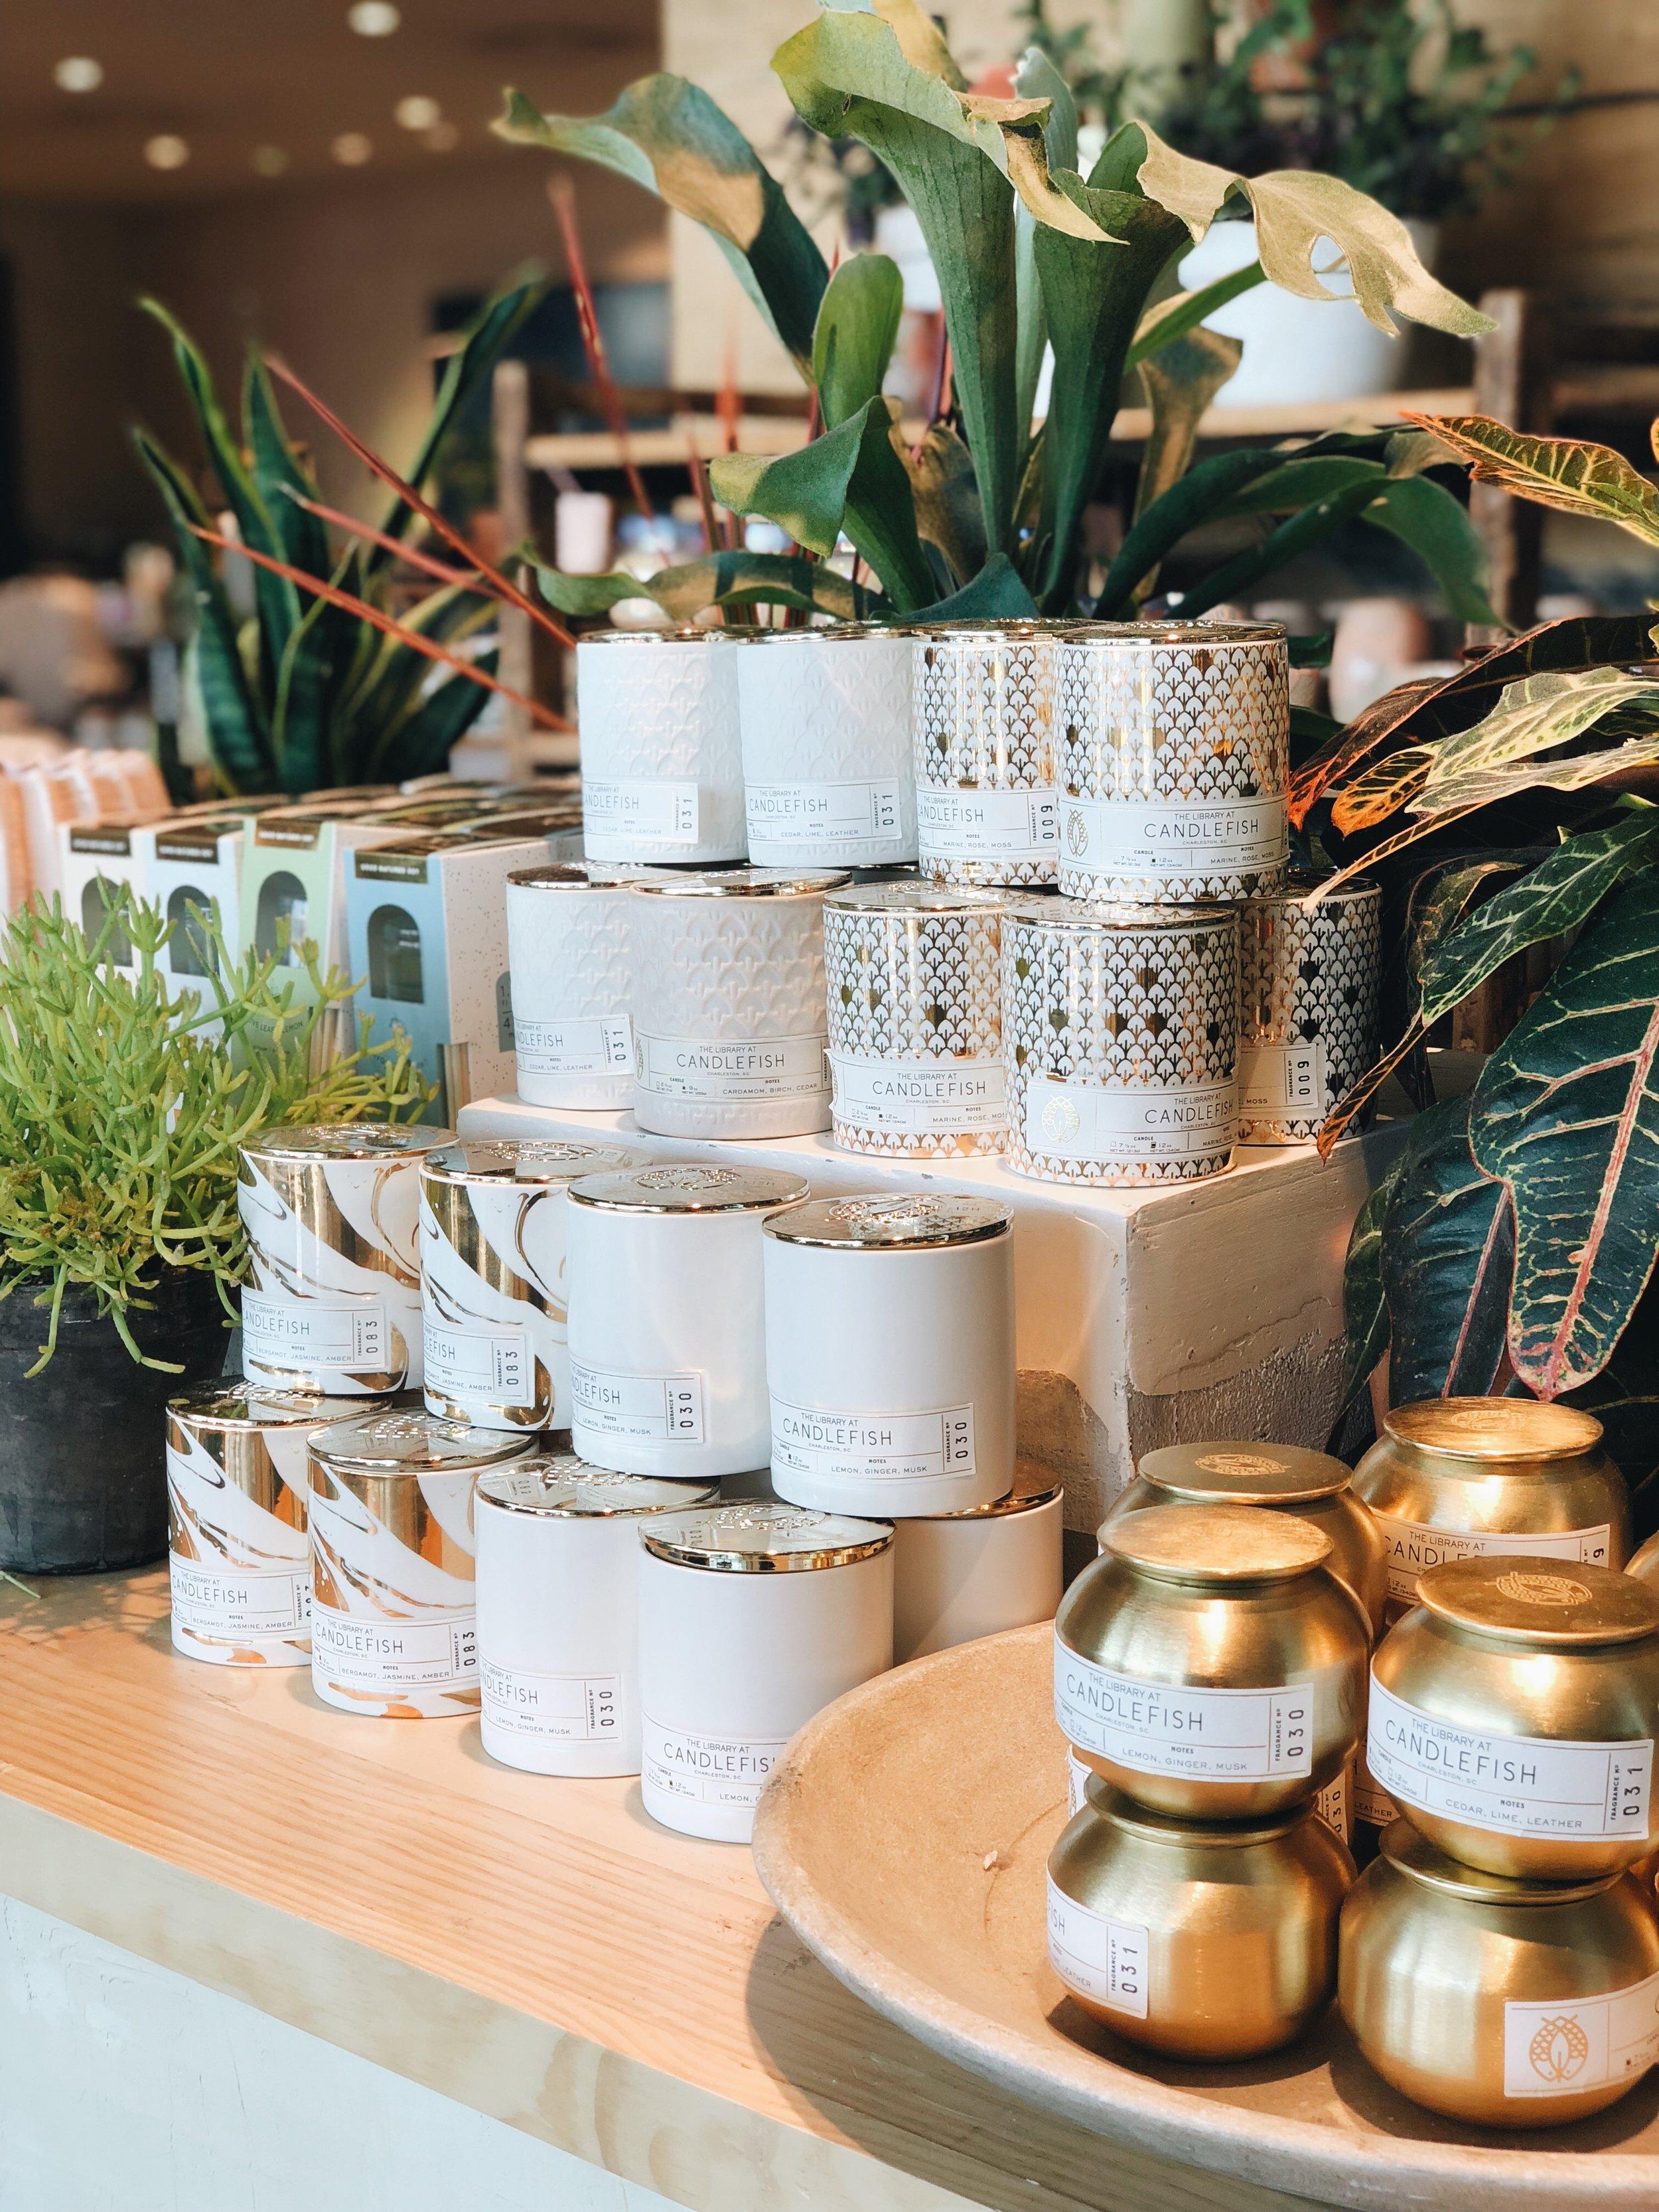 2018 Summer_Boutique Candleshop_2.JPG